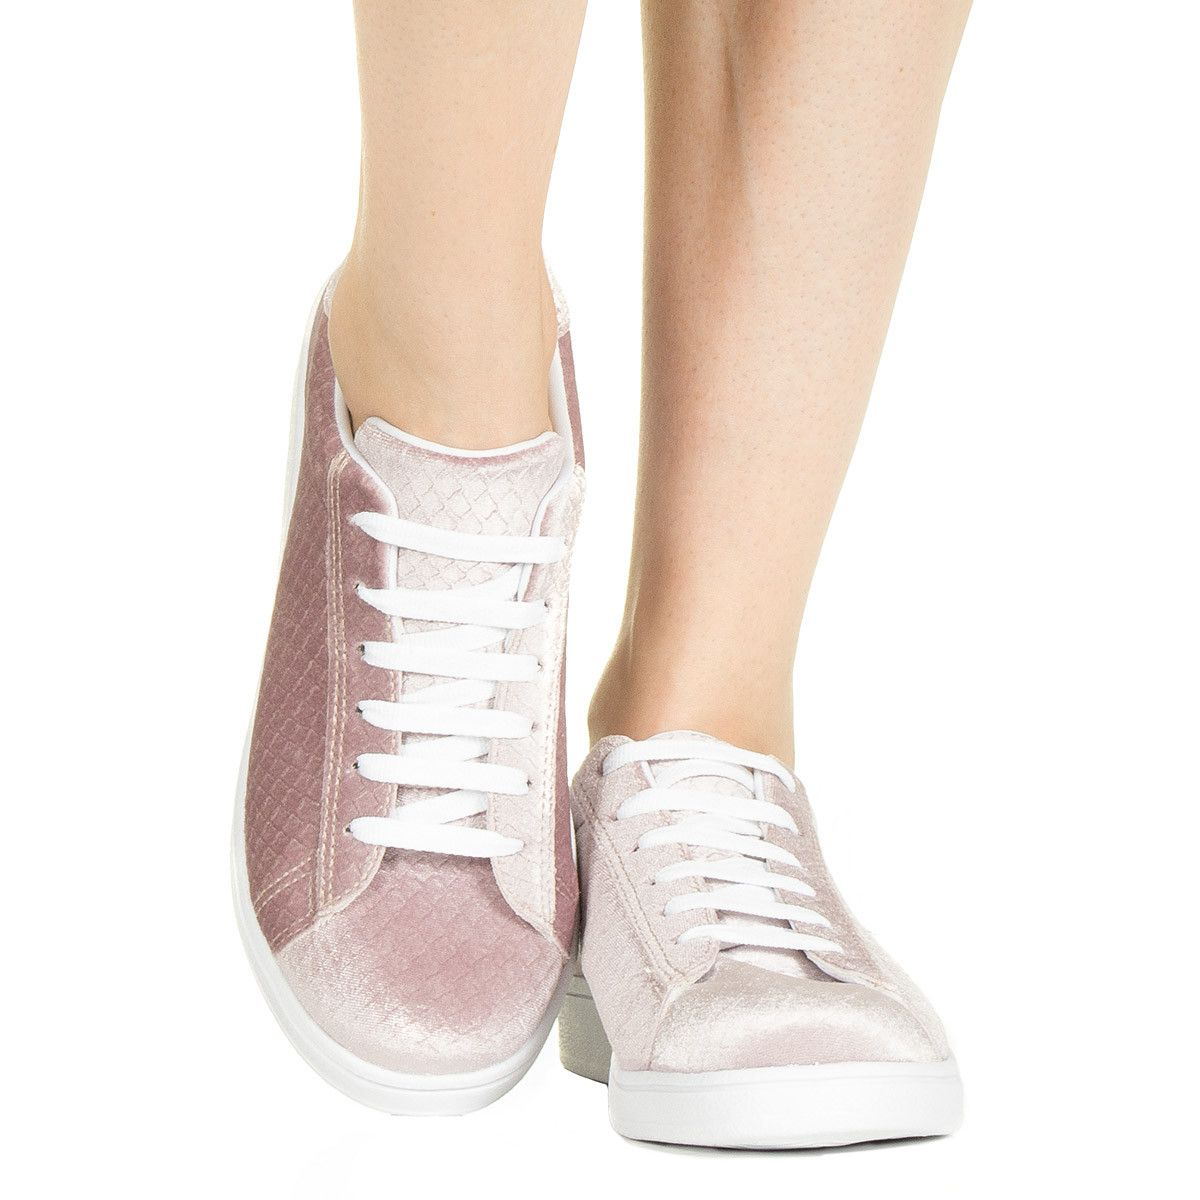 61f6f1bebe Tênis rosé de veludo Taquilla - Taquilla - Loja online de sapatos femininos